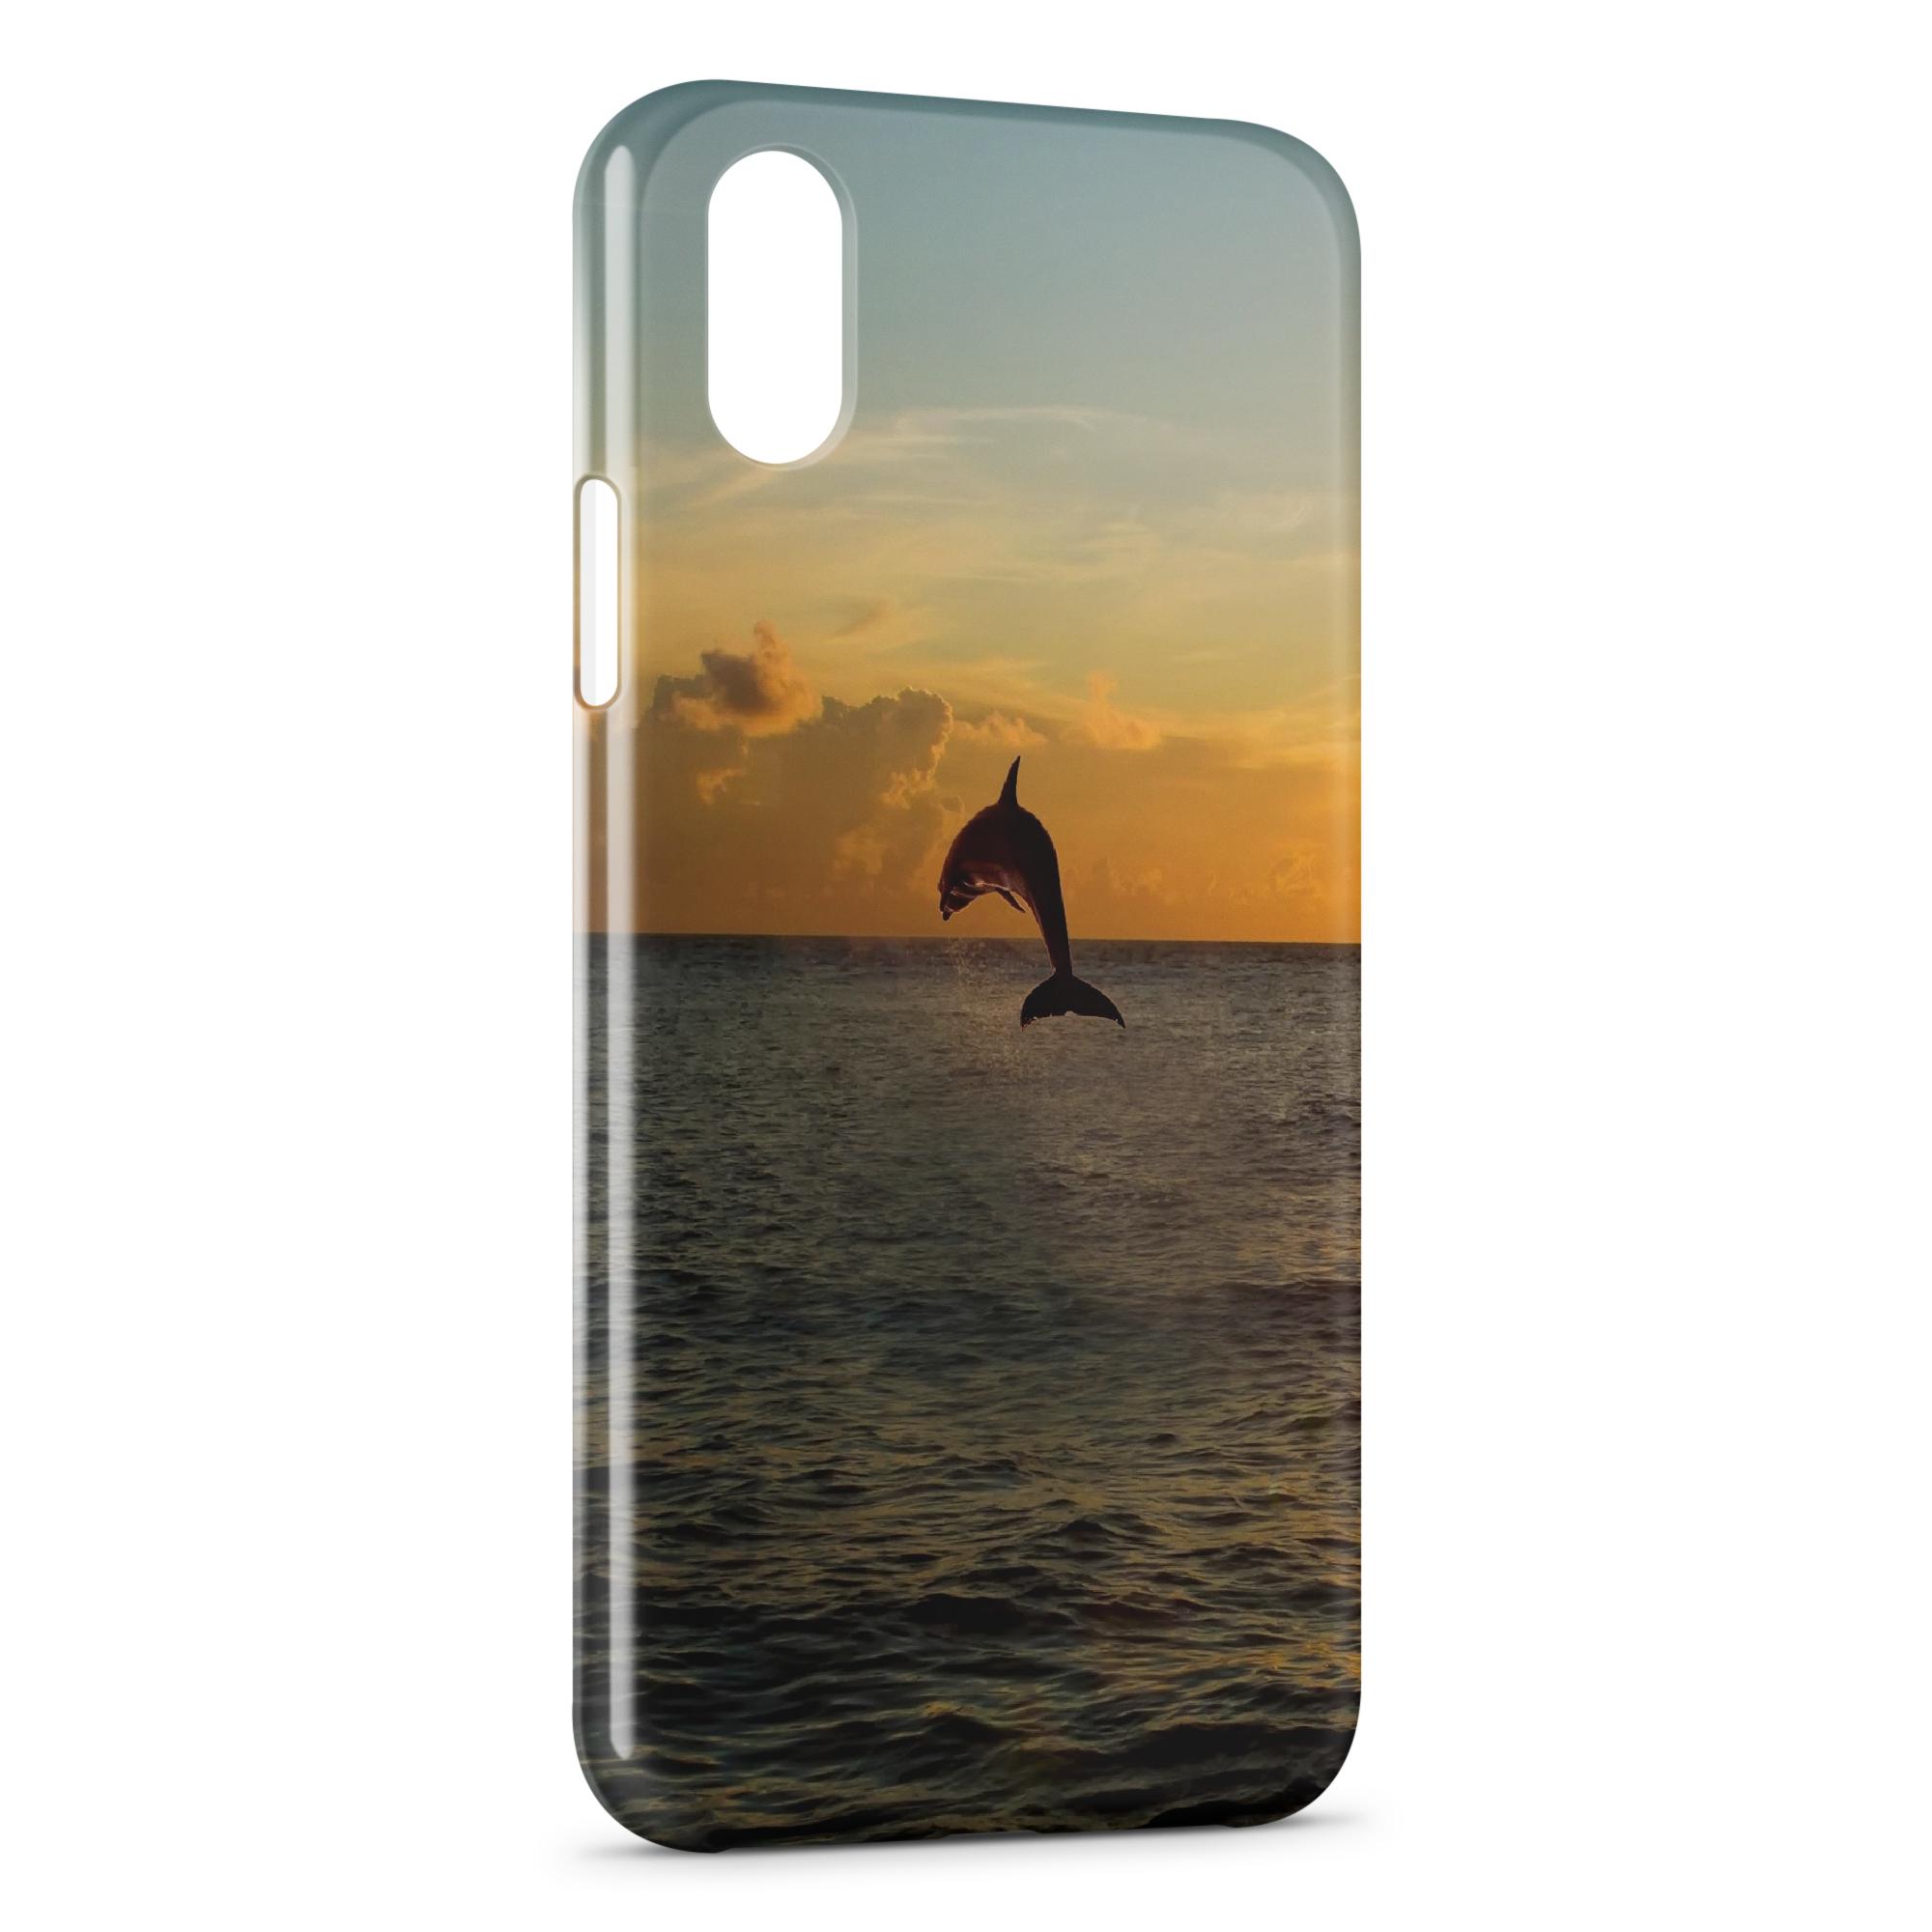 coque iphone 4 dauphin